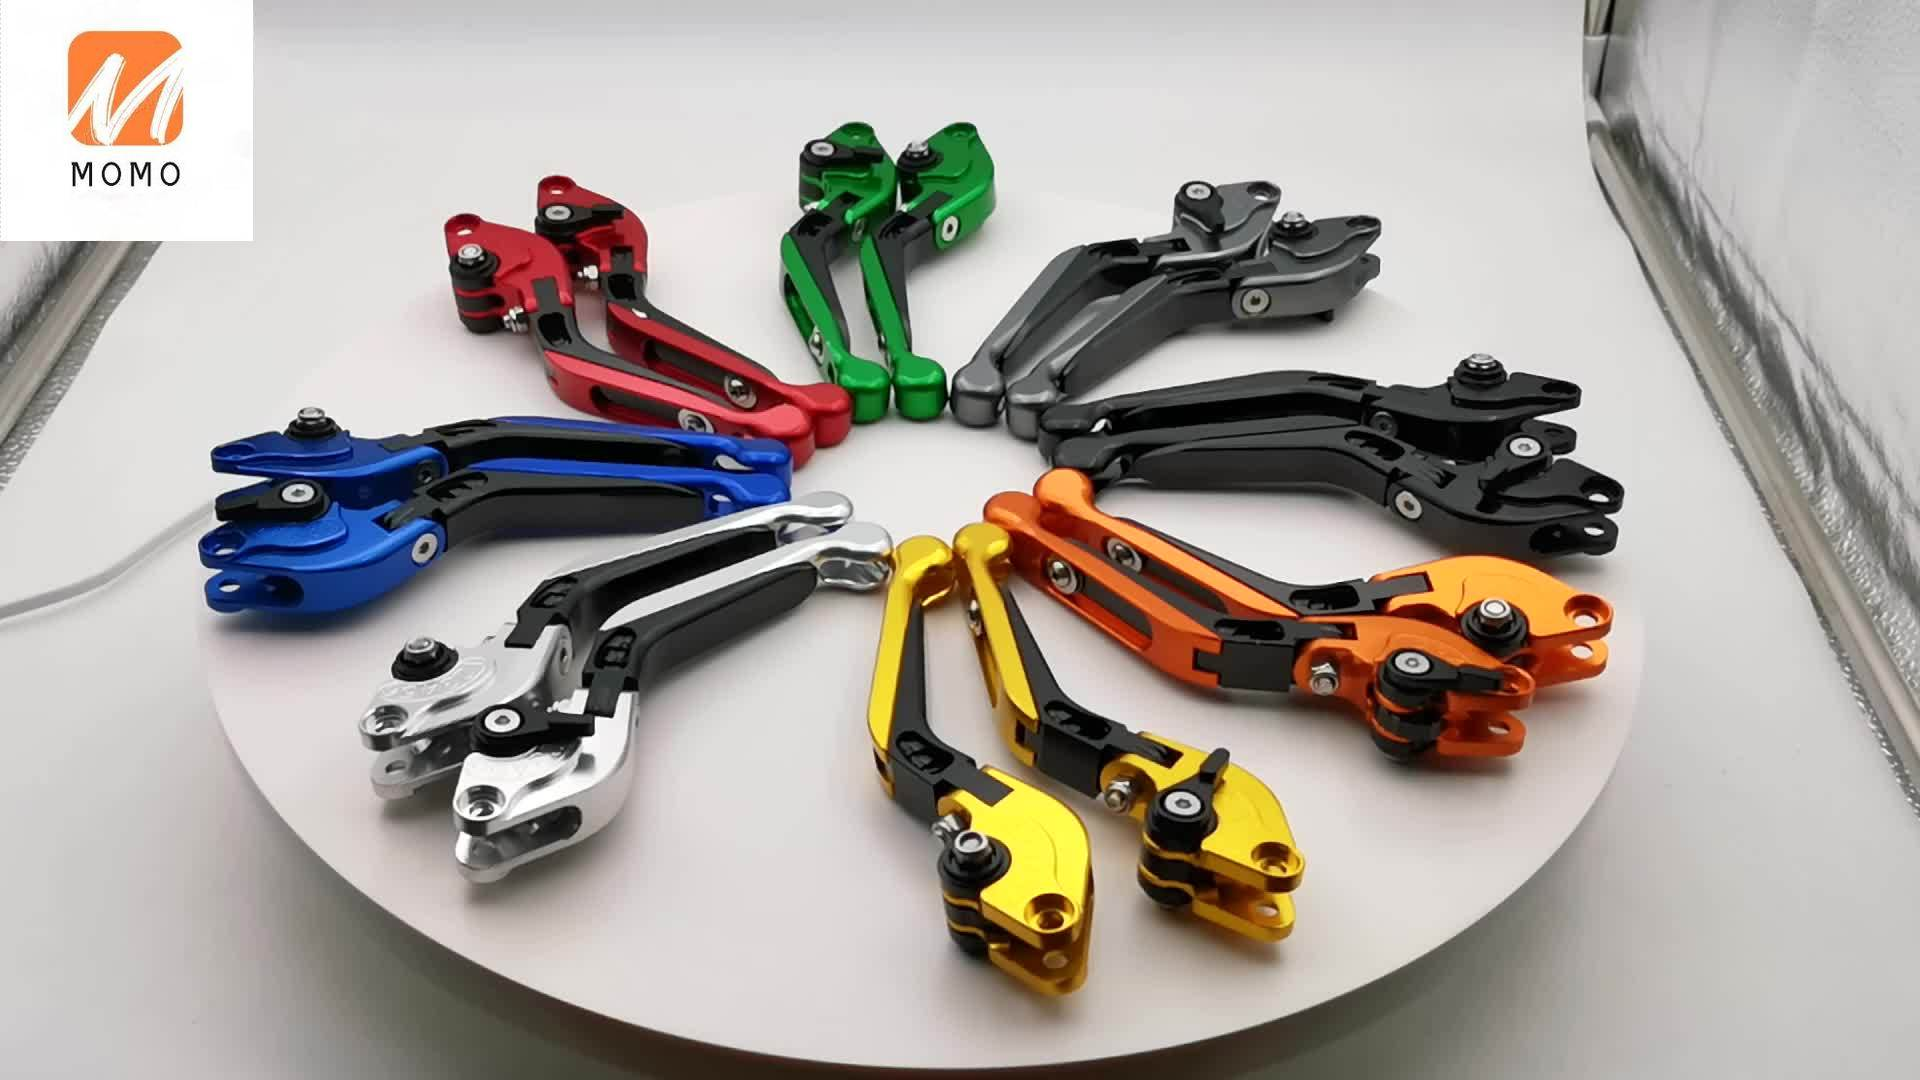 REALZION Wholesale Motorcycle Folding Extendable Adjustable CNC Aluminum Brake Clutch Levers For Yamaha MT07 MT09 FZ-07 FZ-09 недорого